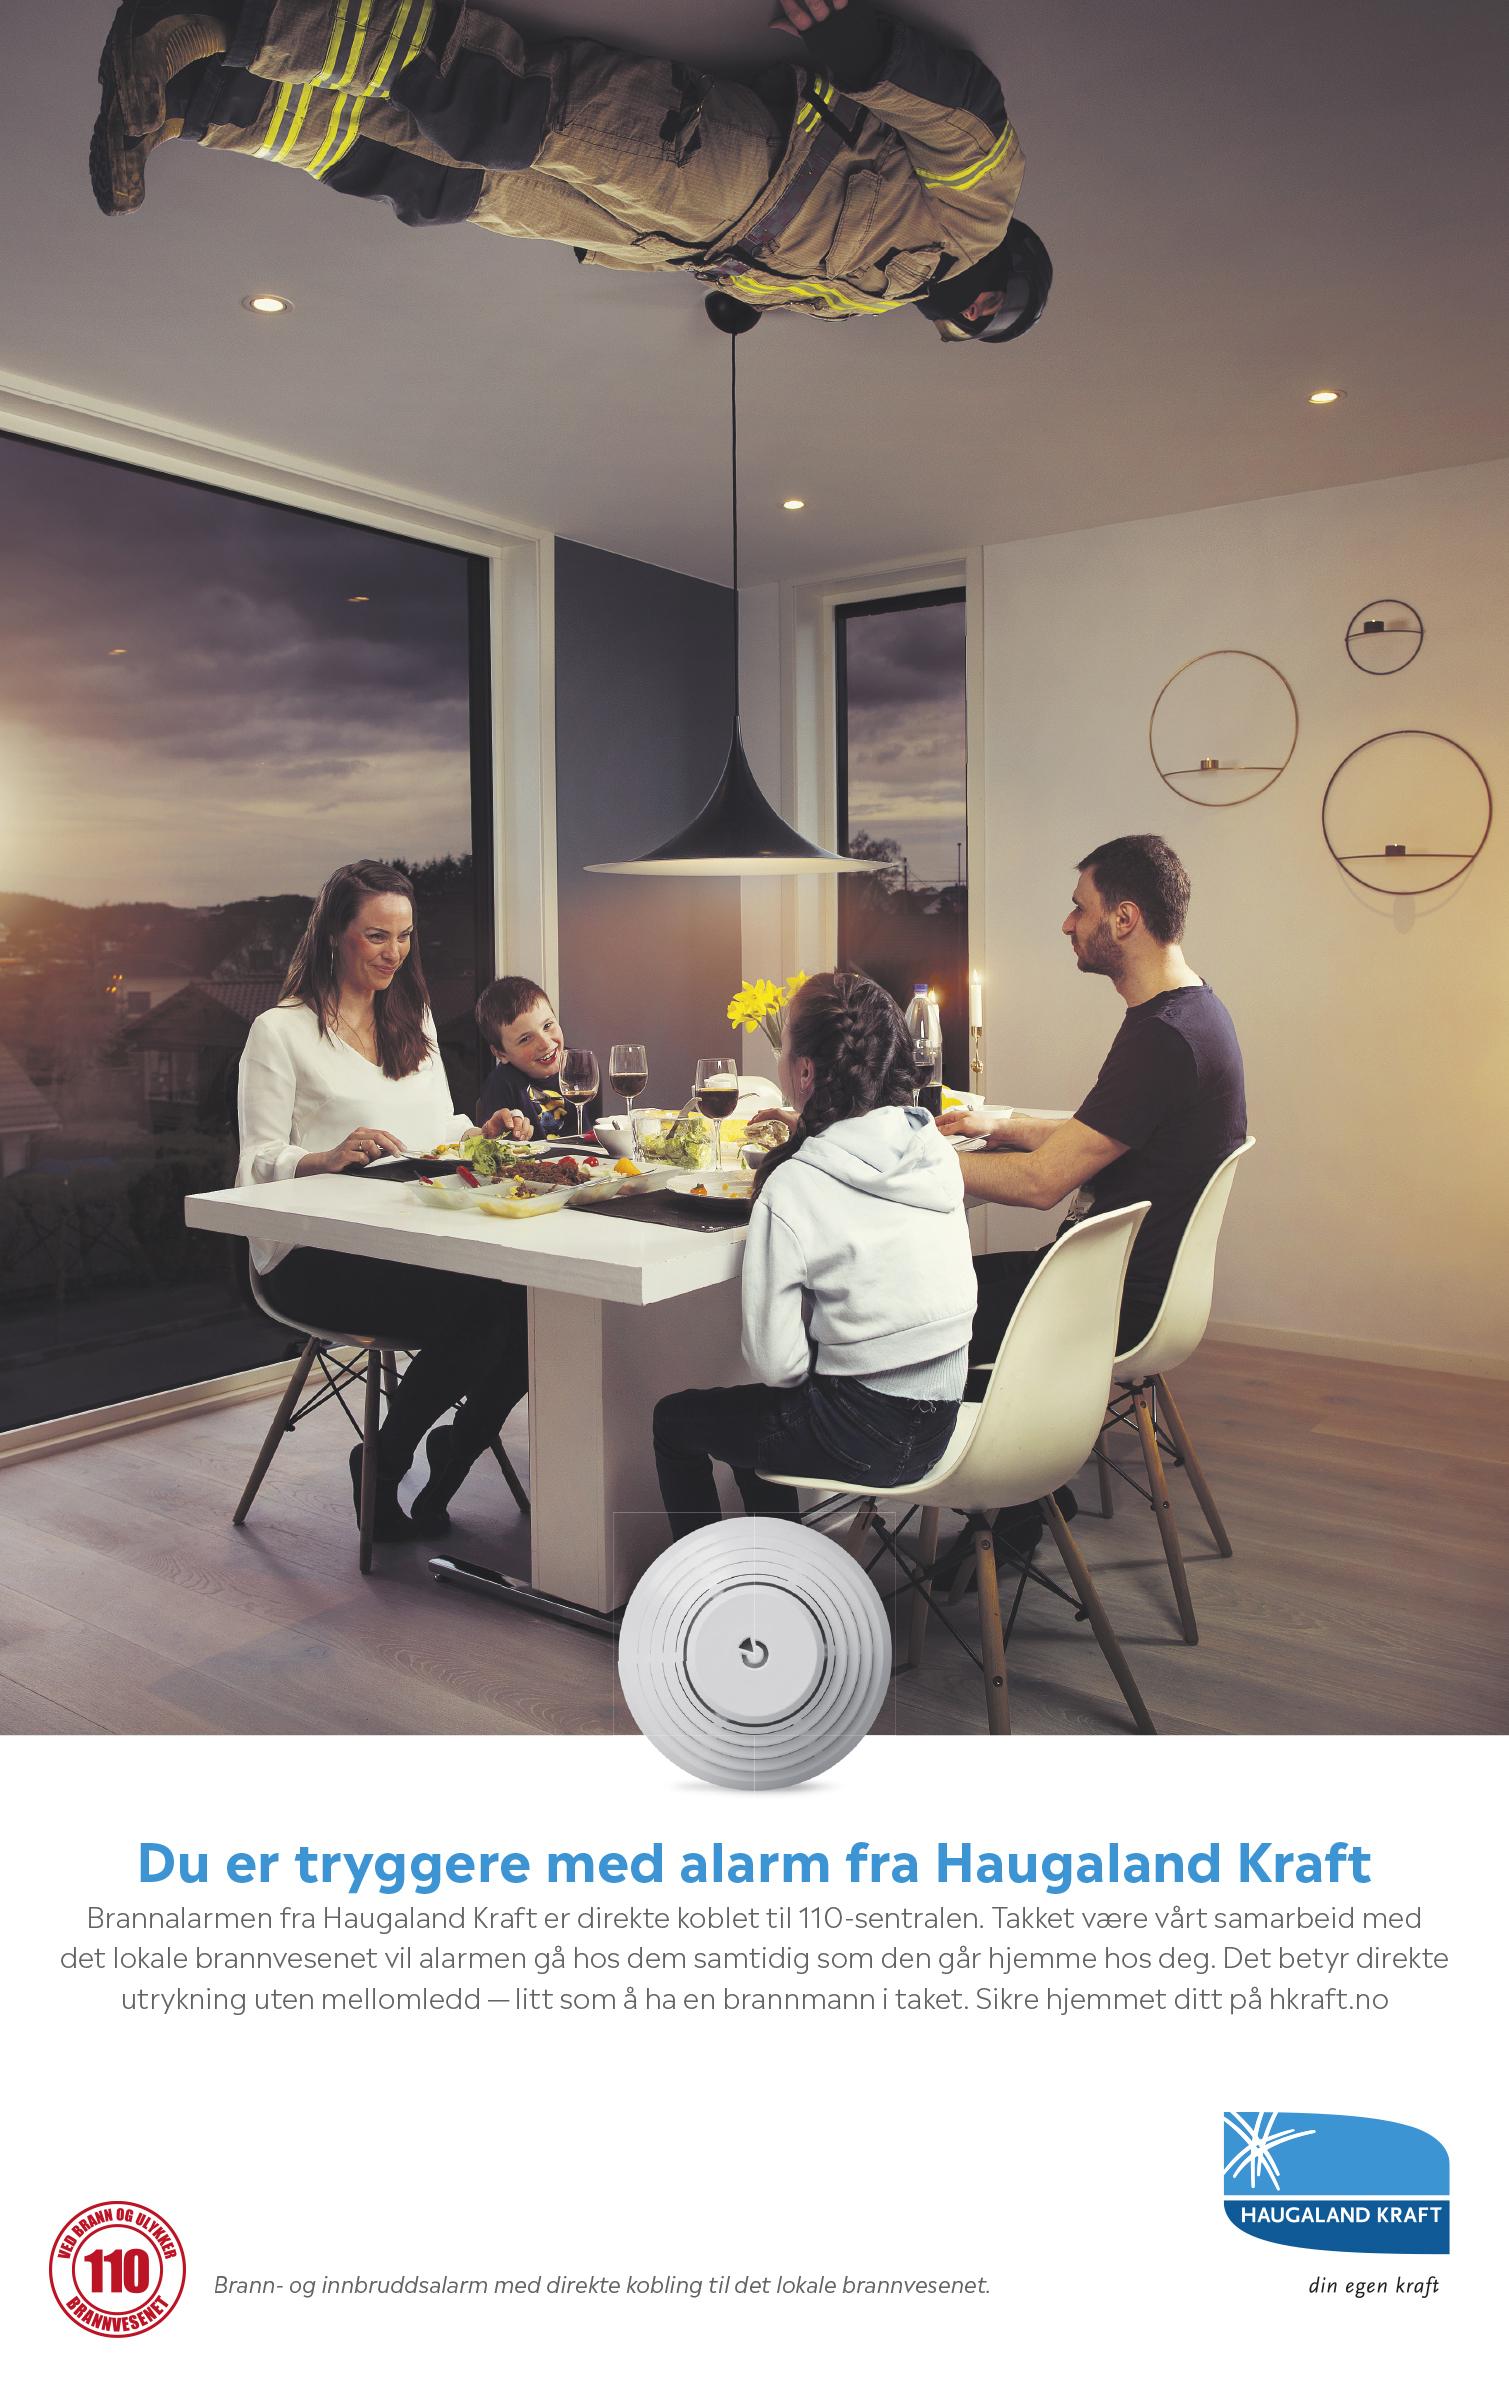 HaugalandKraft_Alarm_Helside_246x365_Trykk 2.jpg